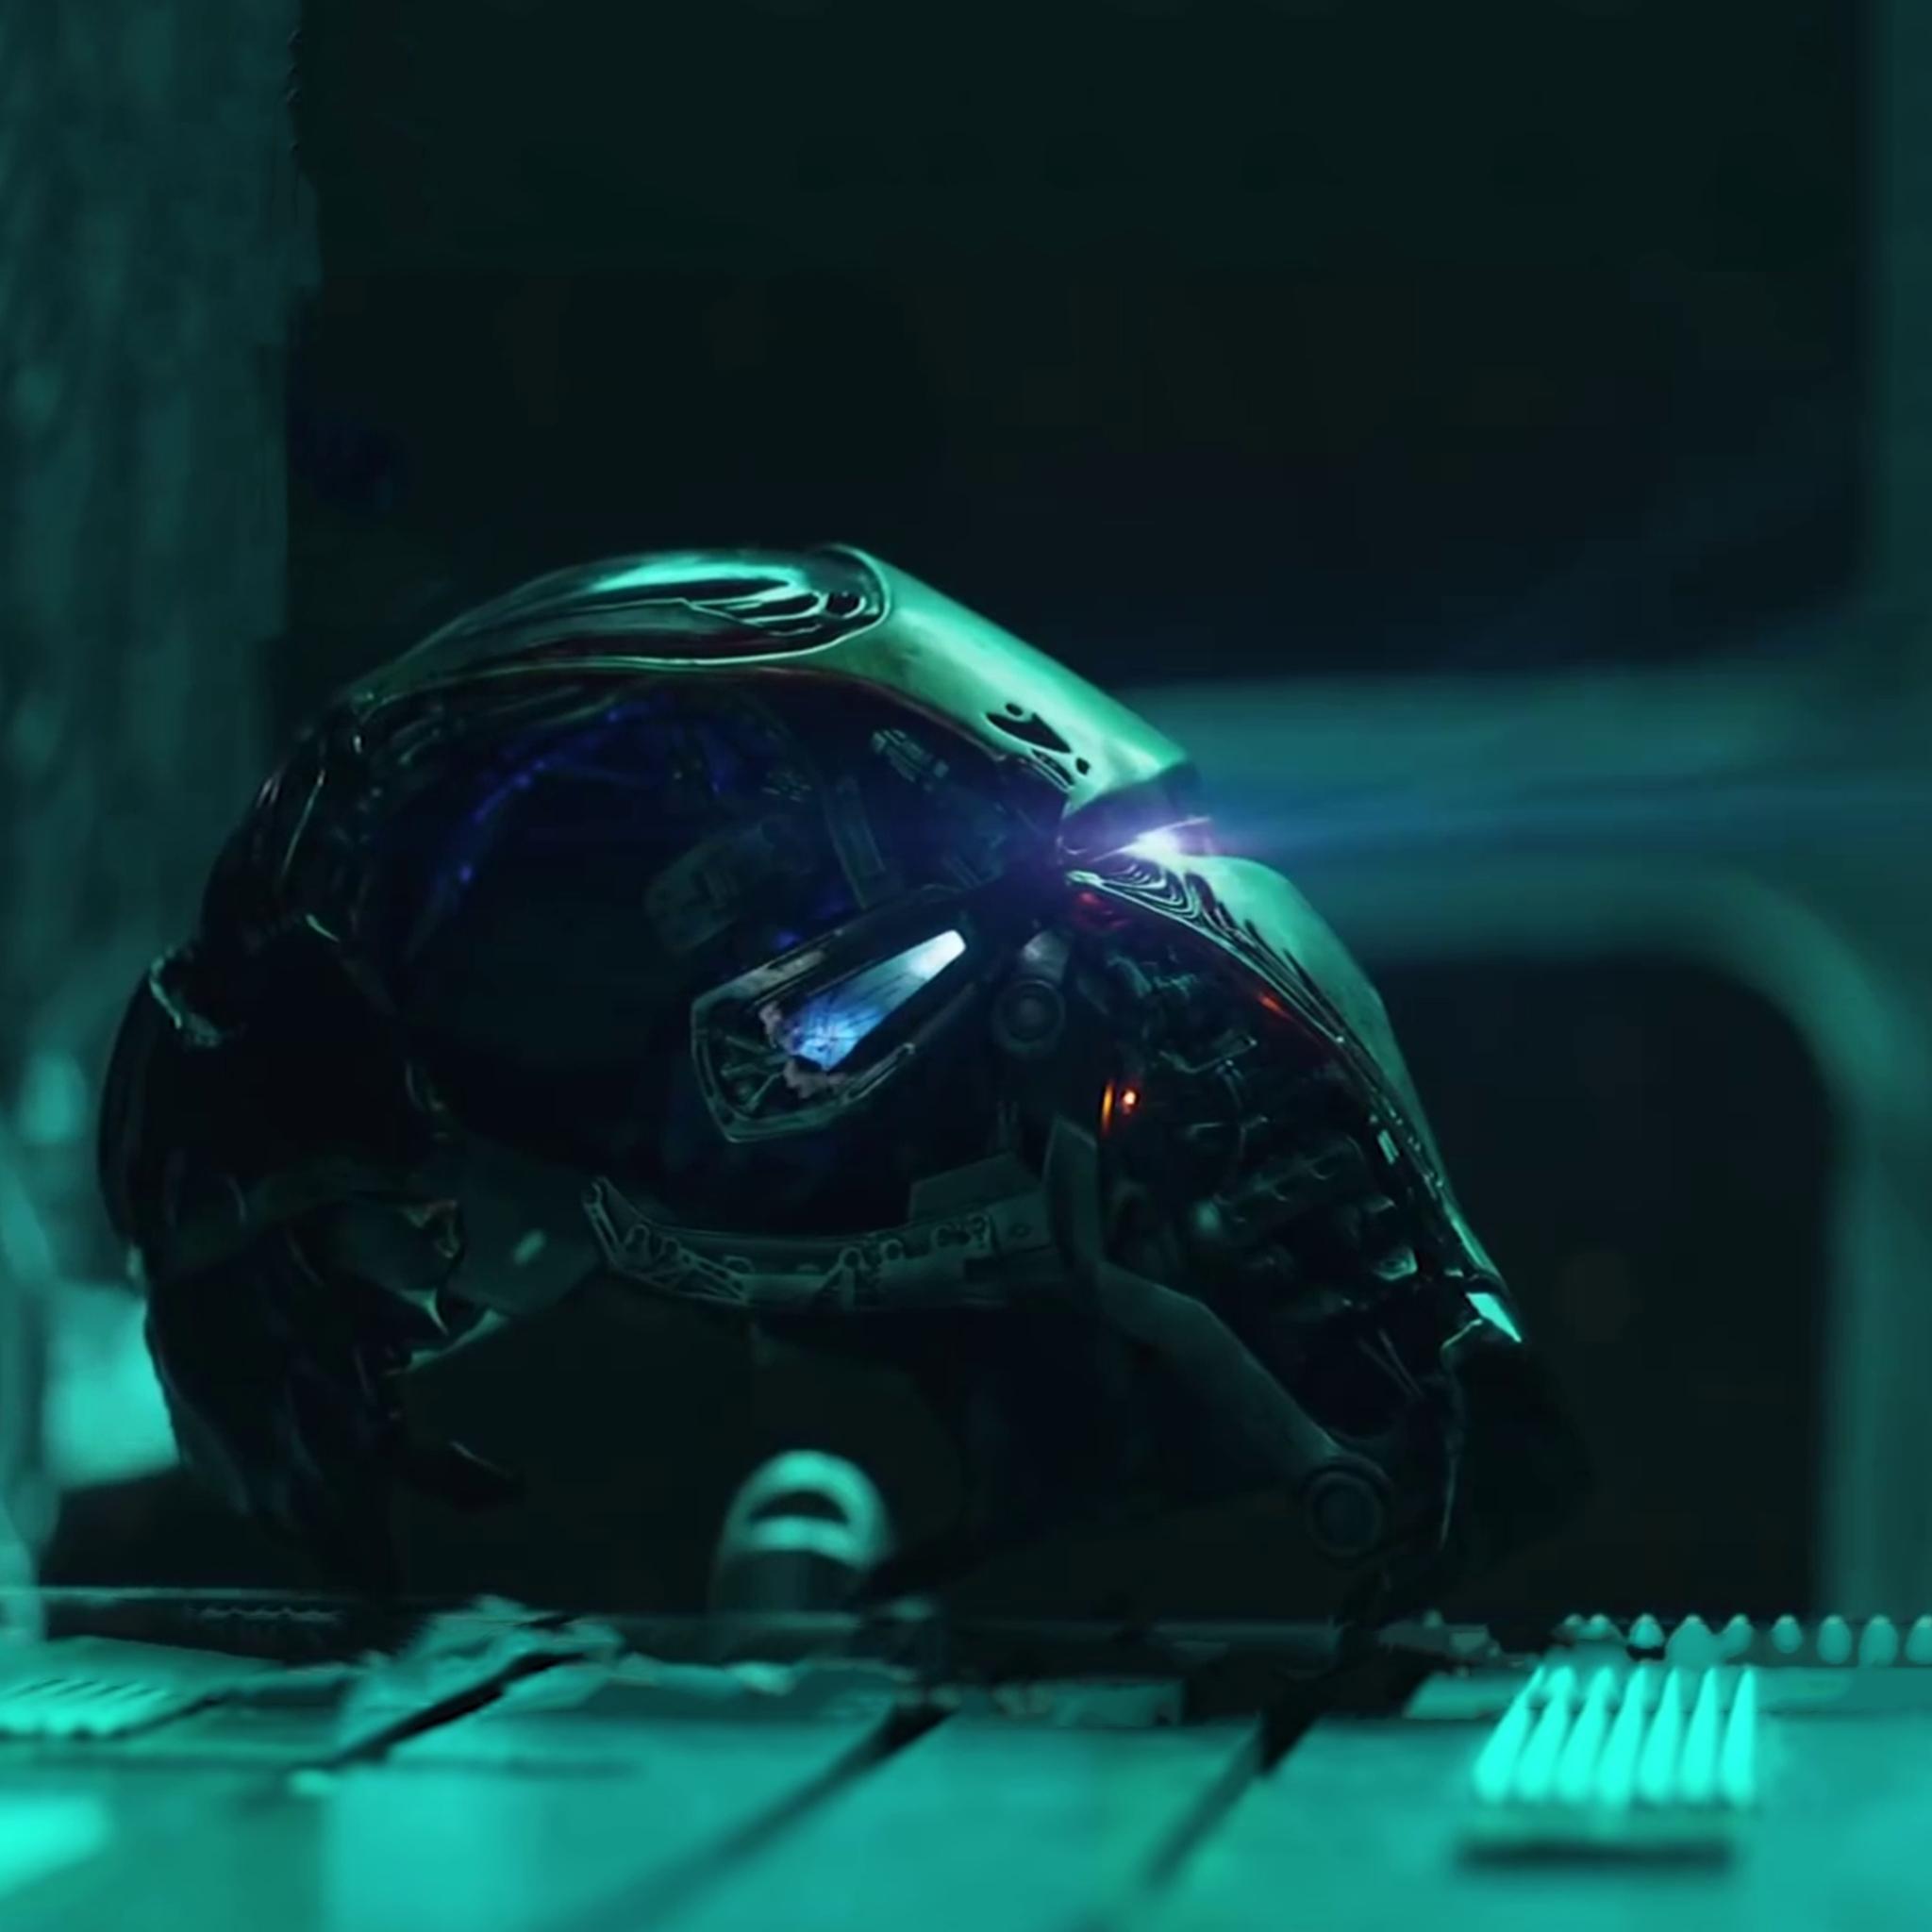 2048x2048 Iron Man Helmet From Avengers Endgame Ipad Air